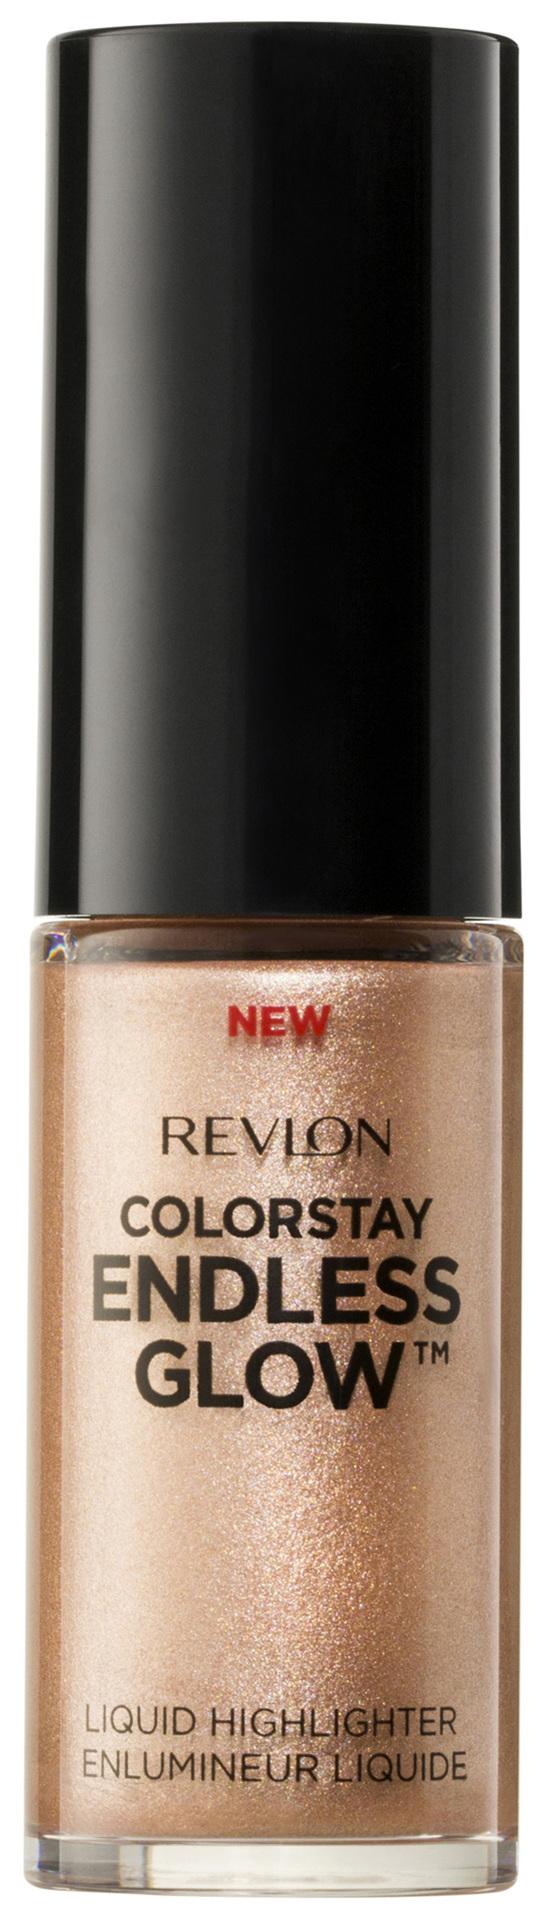 Revlon Colorstay Endless Glow™ Liquid Highlighter - Topaz